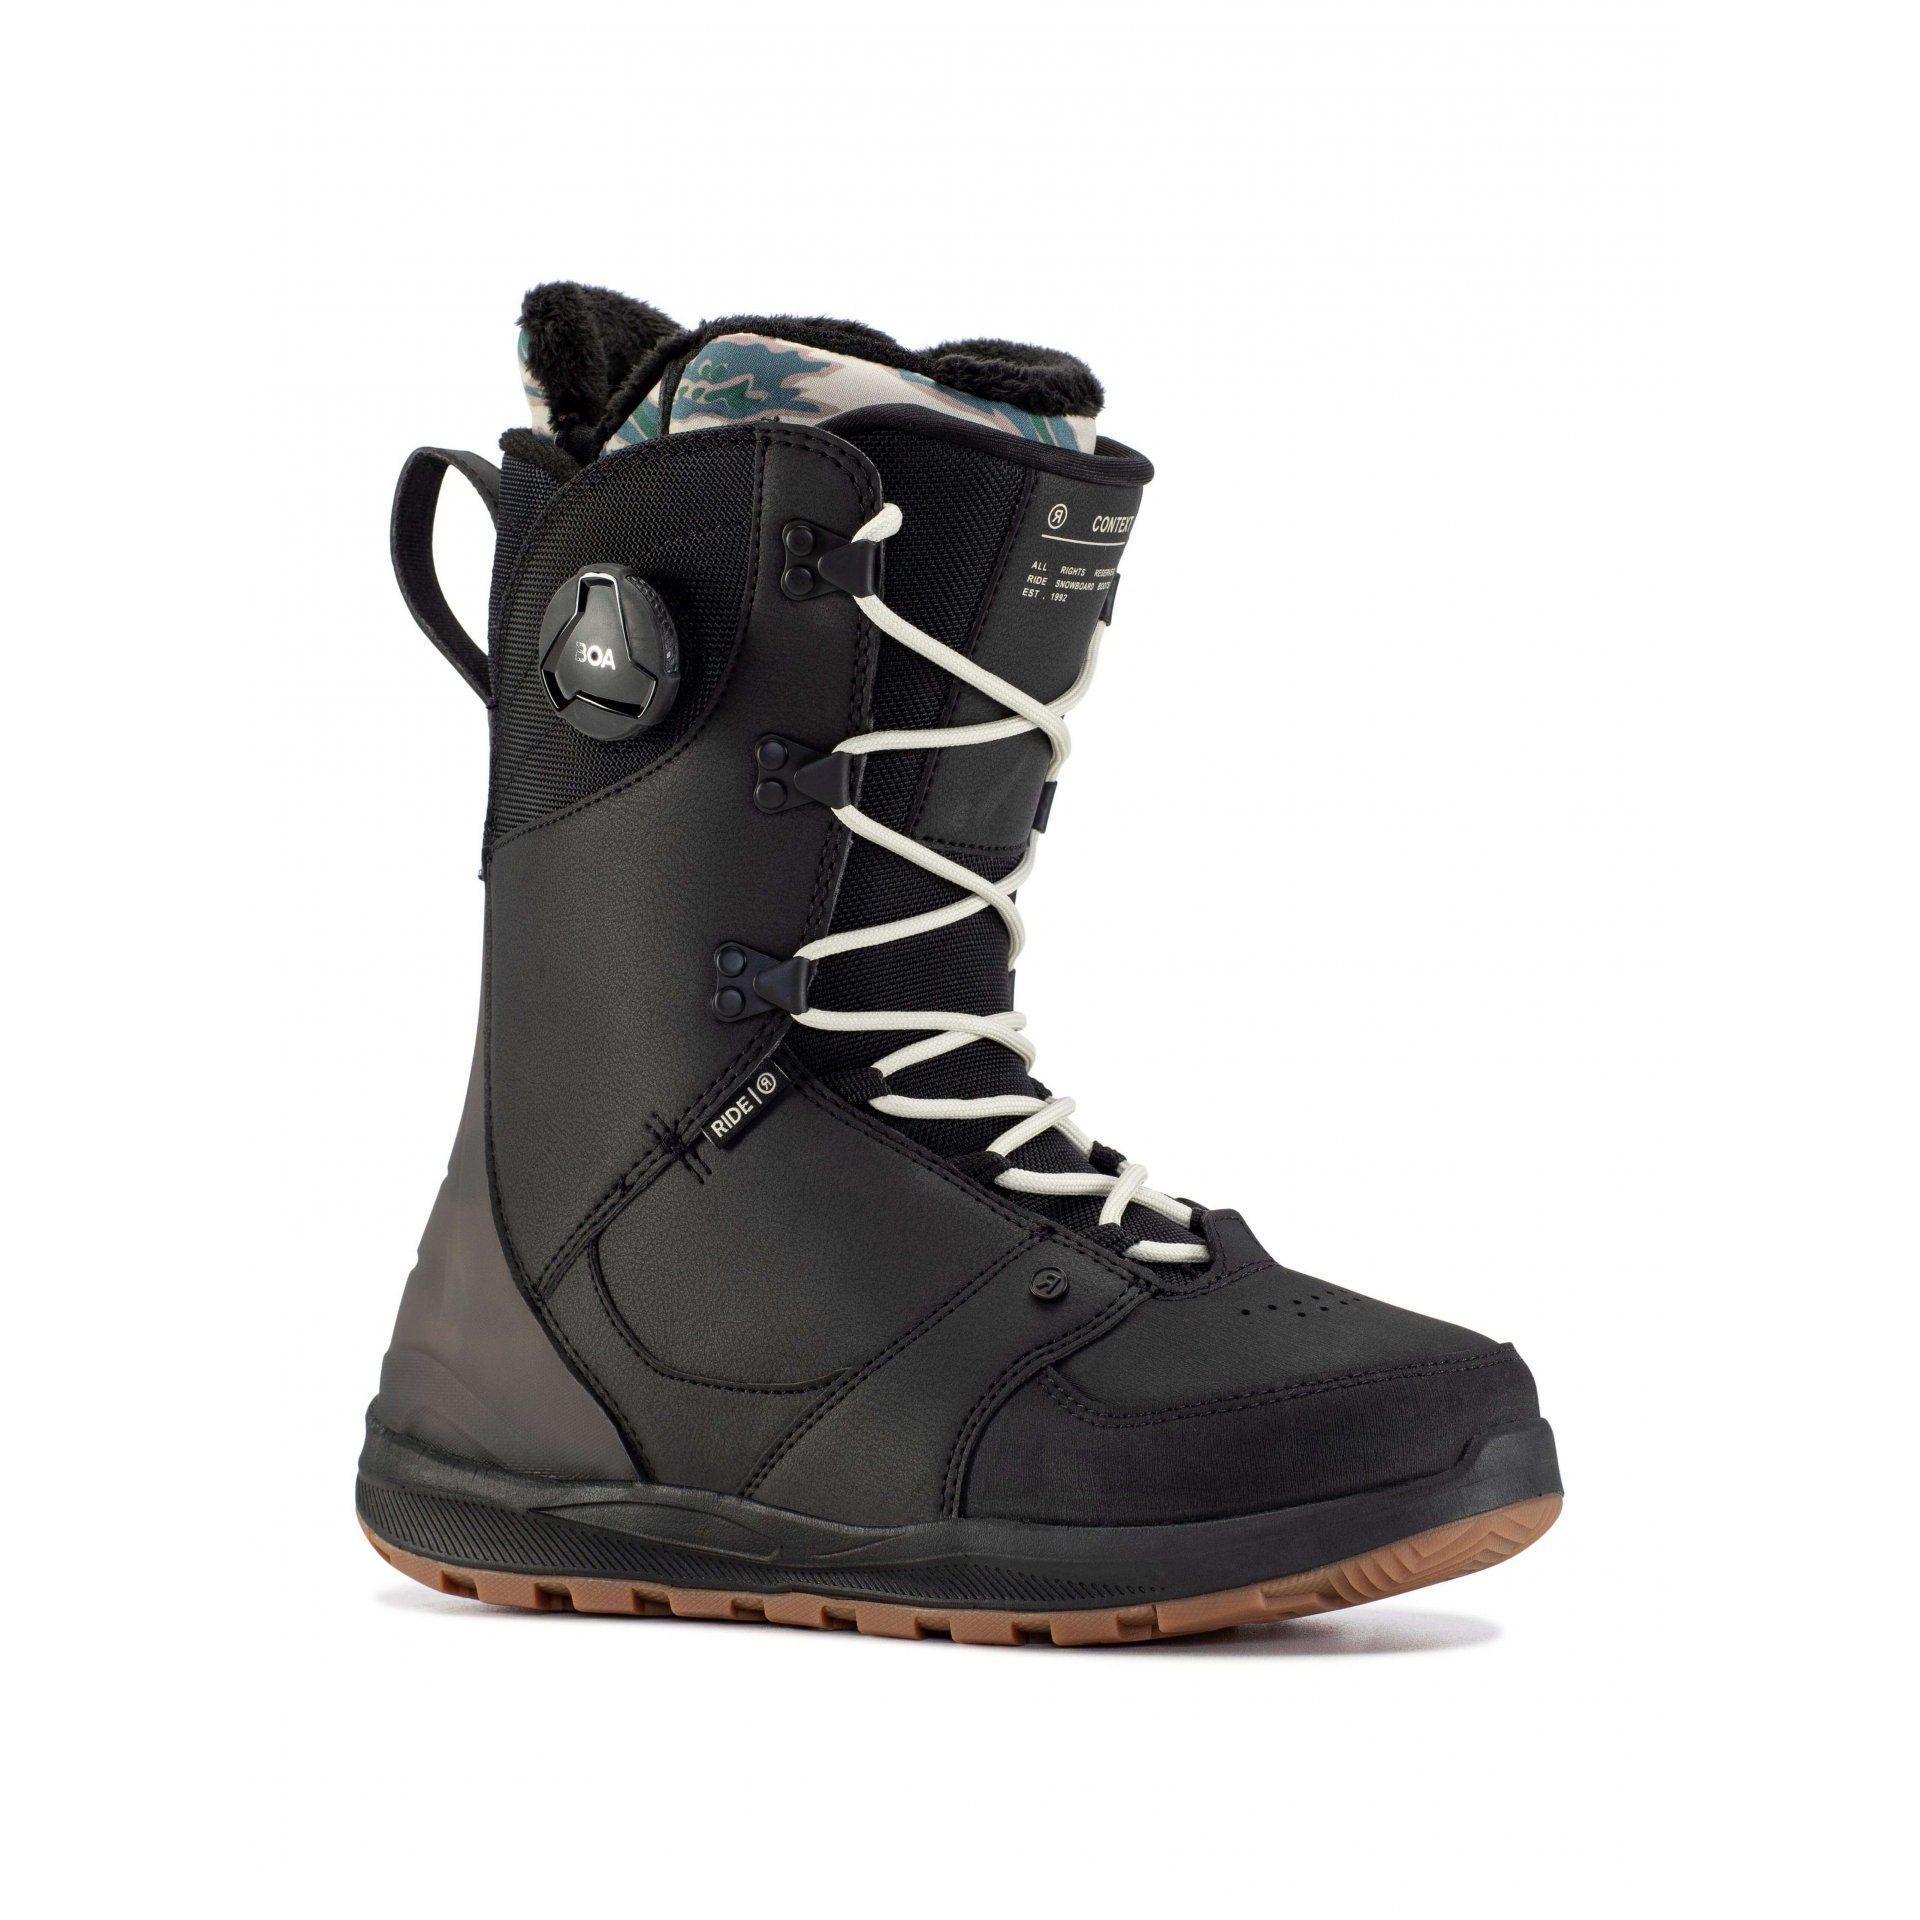 BUTY SNOWBOARDOWE RIDE CONTEXT 104153 BLACK 1